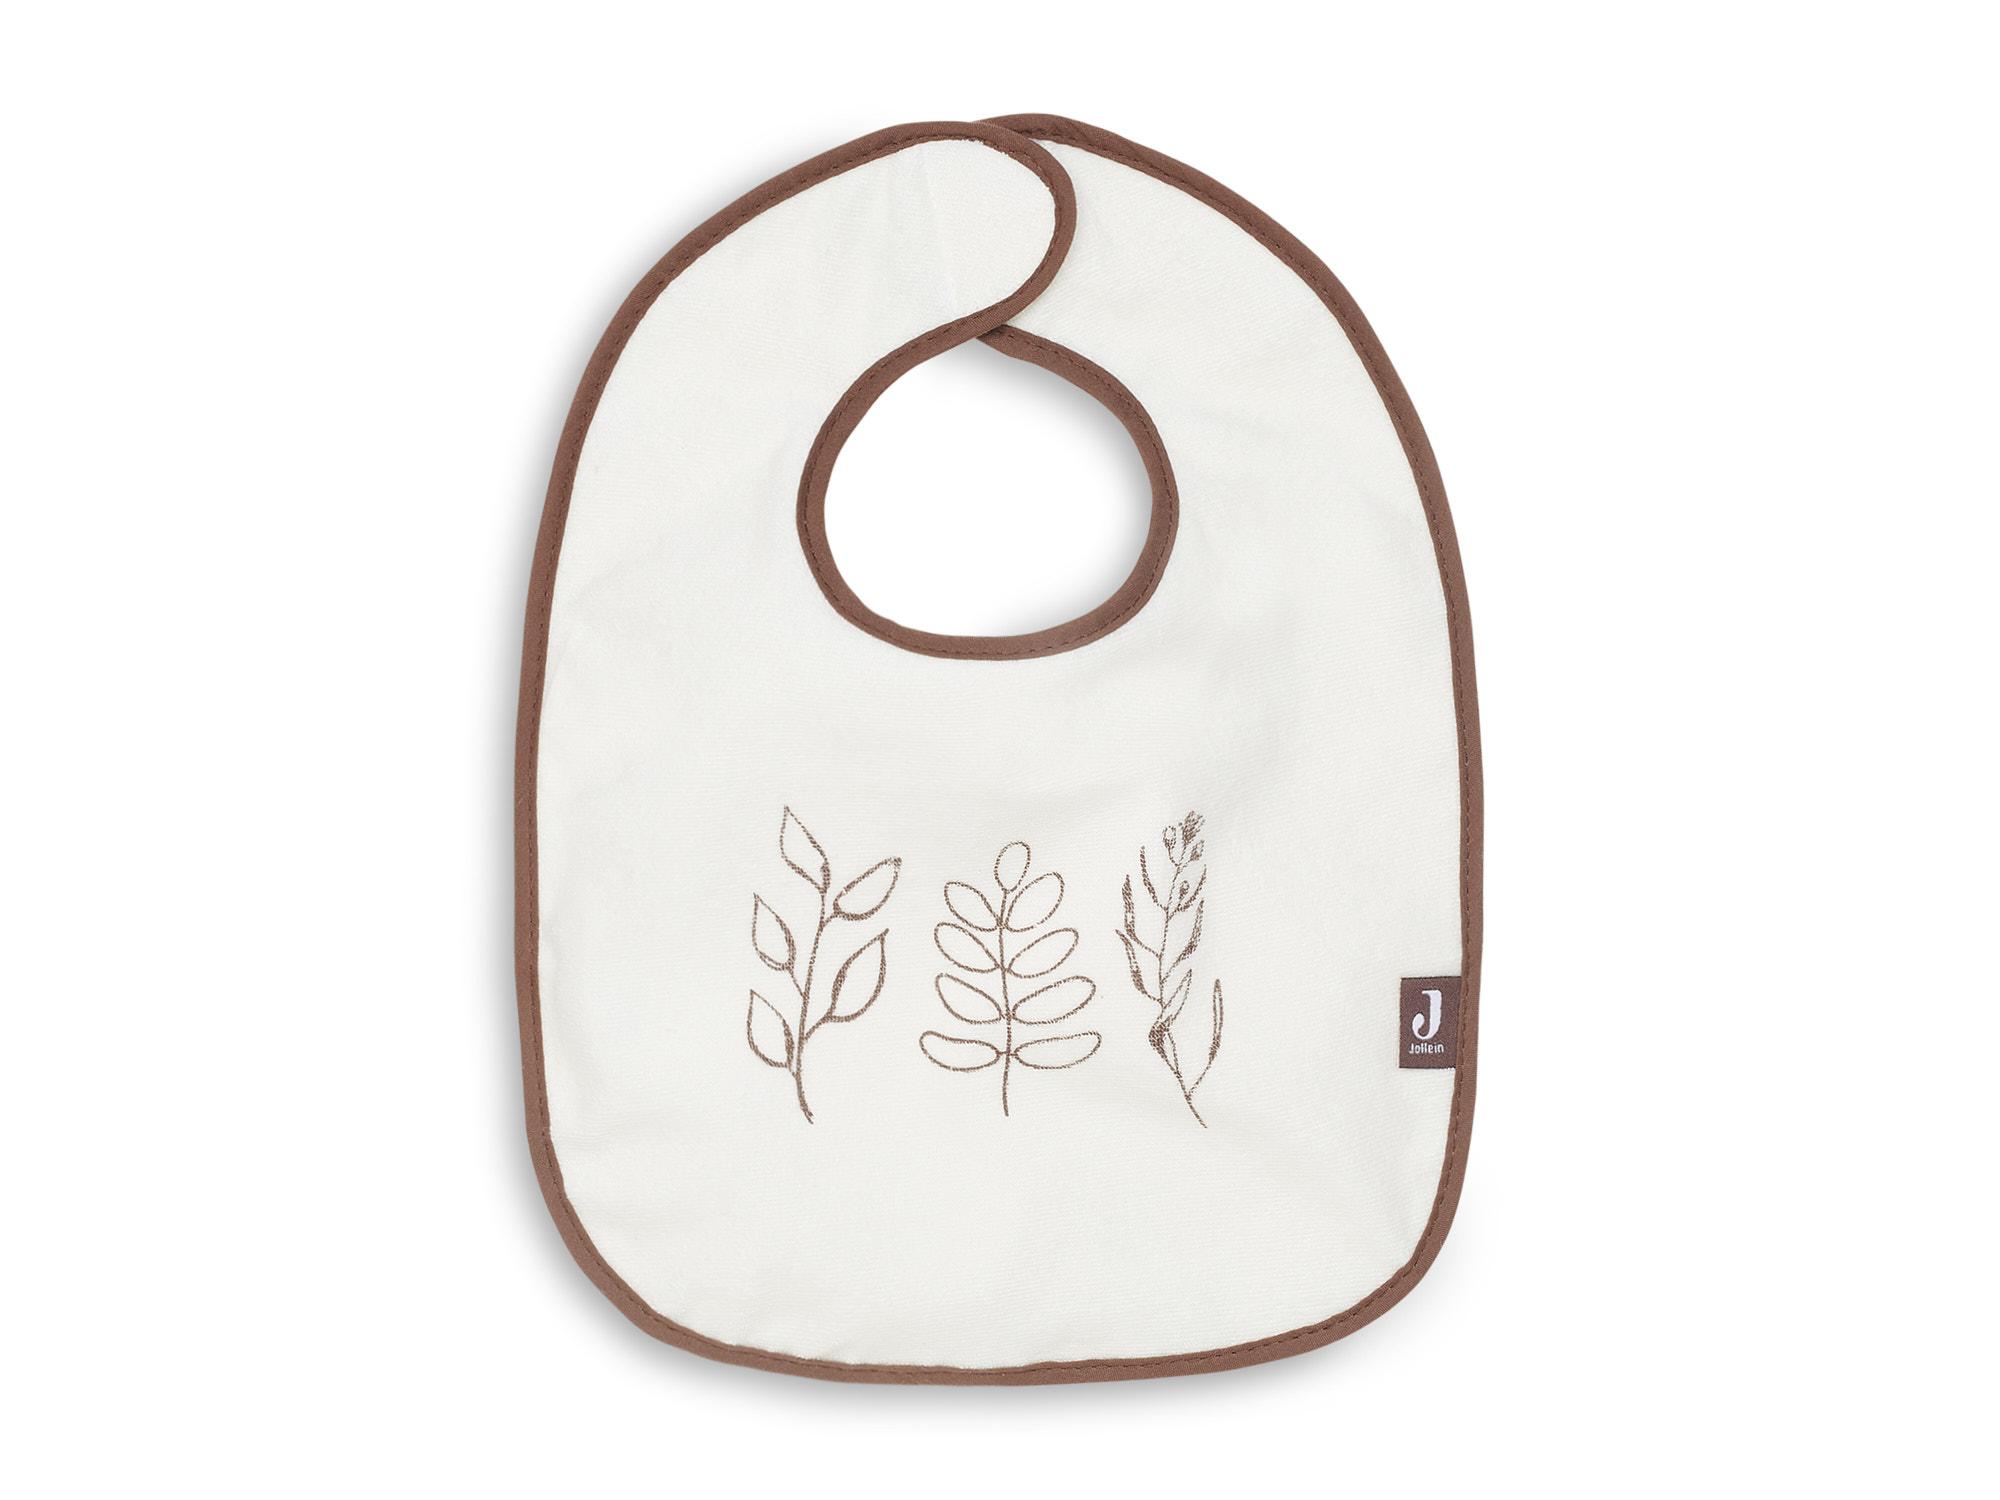 Afbeelding Jollein Slab Meadow I Chestnut (3 pack)